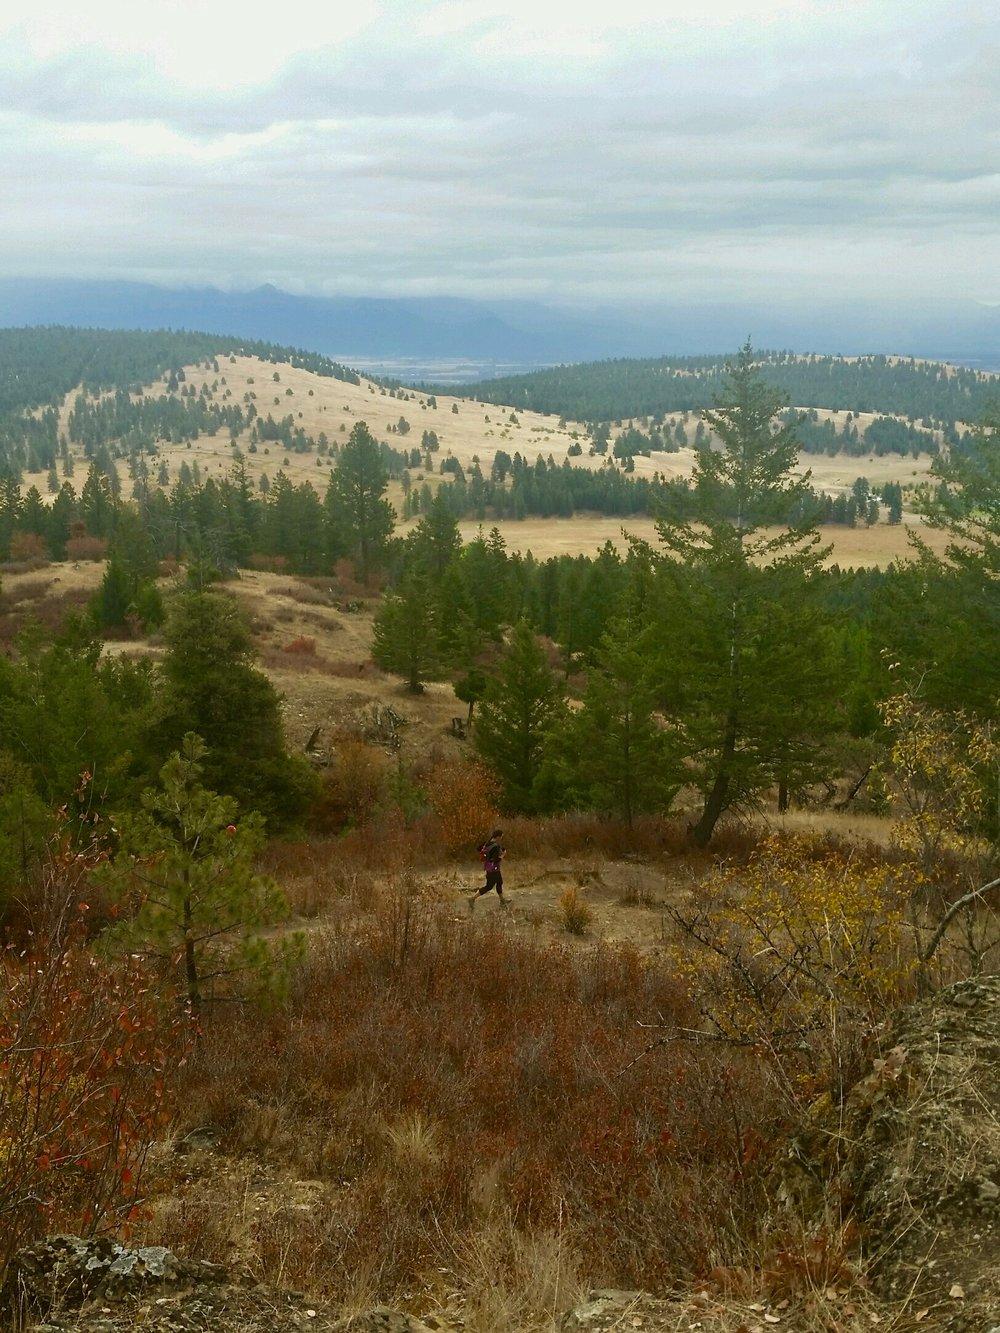 foys to blacktail trails trail marathon ftbtIMG_1766.JPG